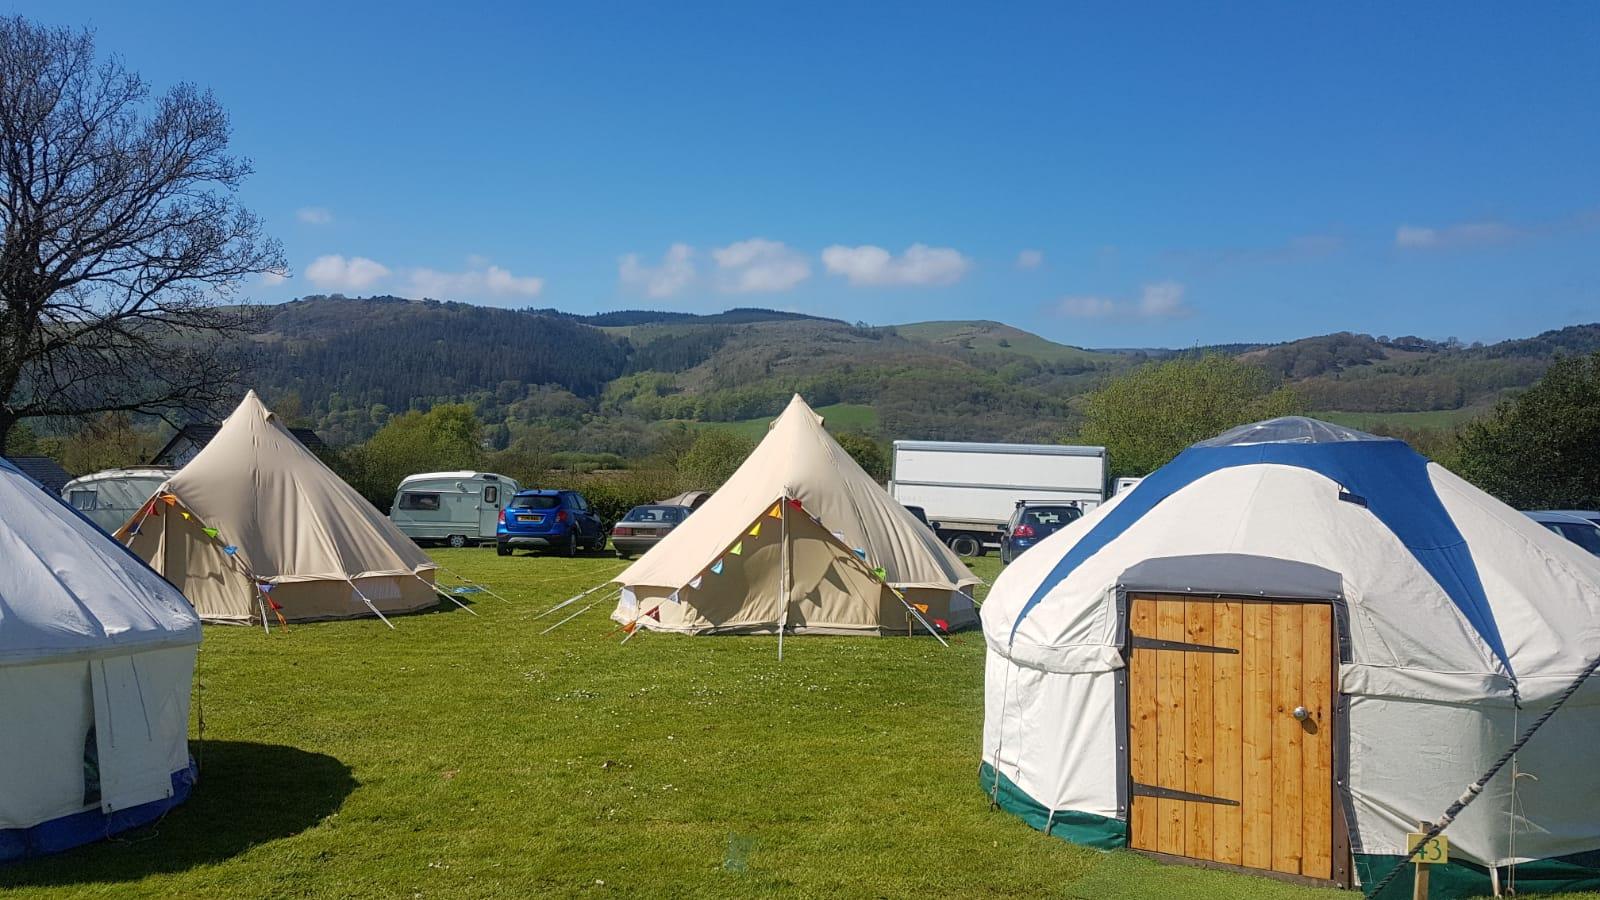 Fred's Yurts